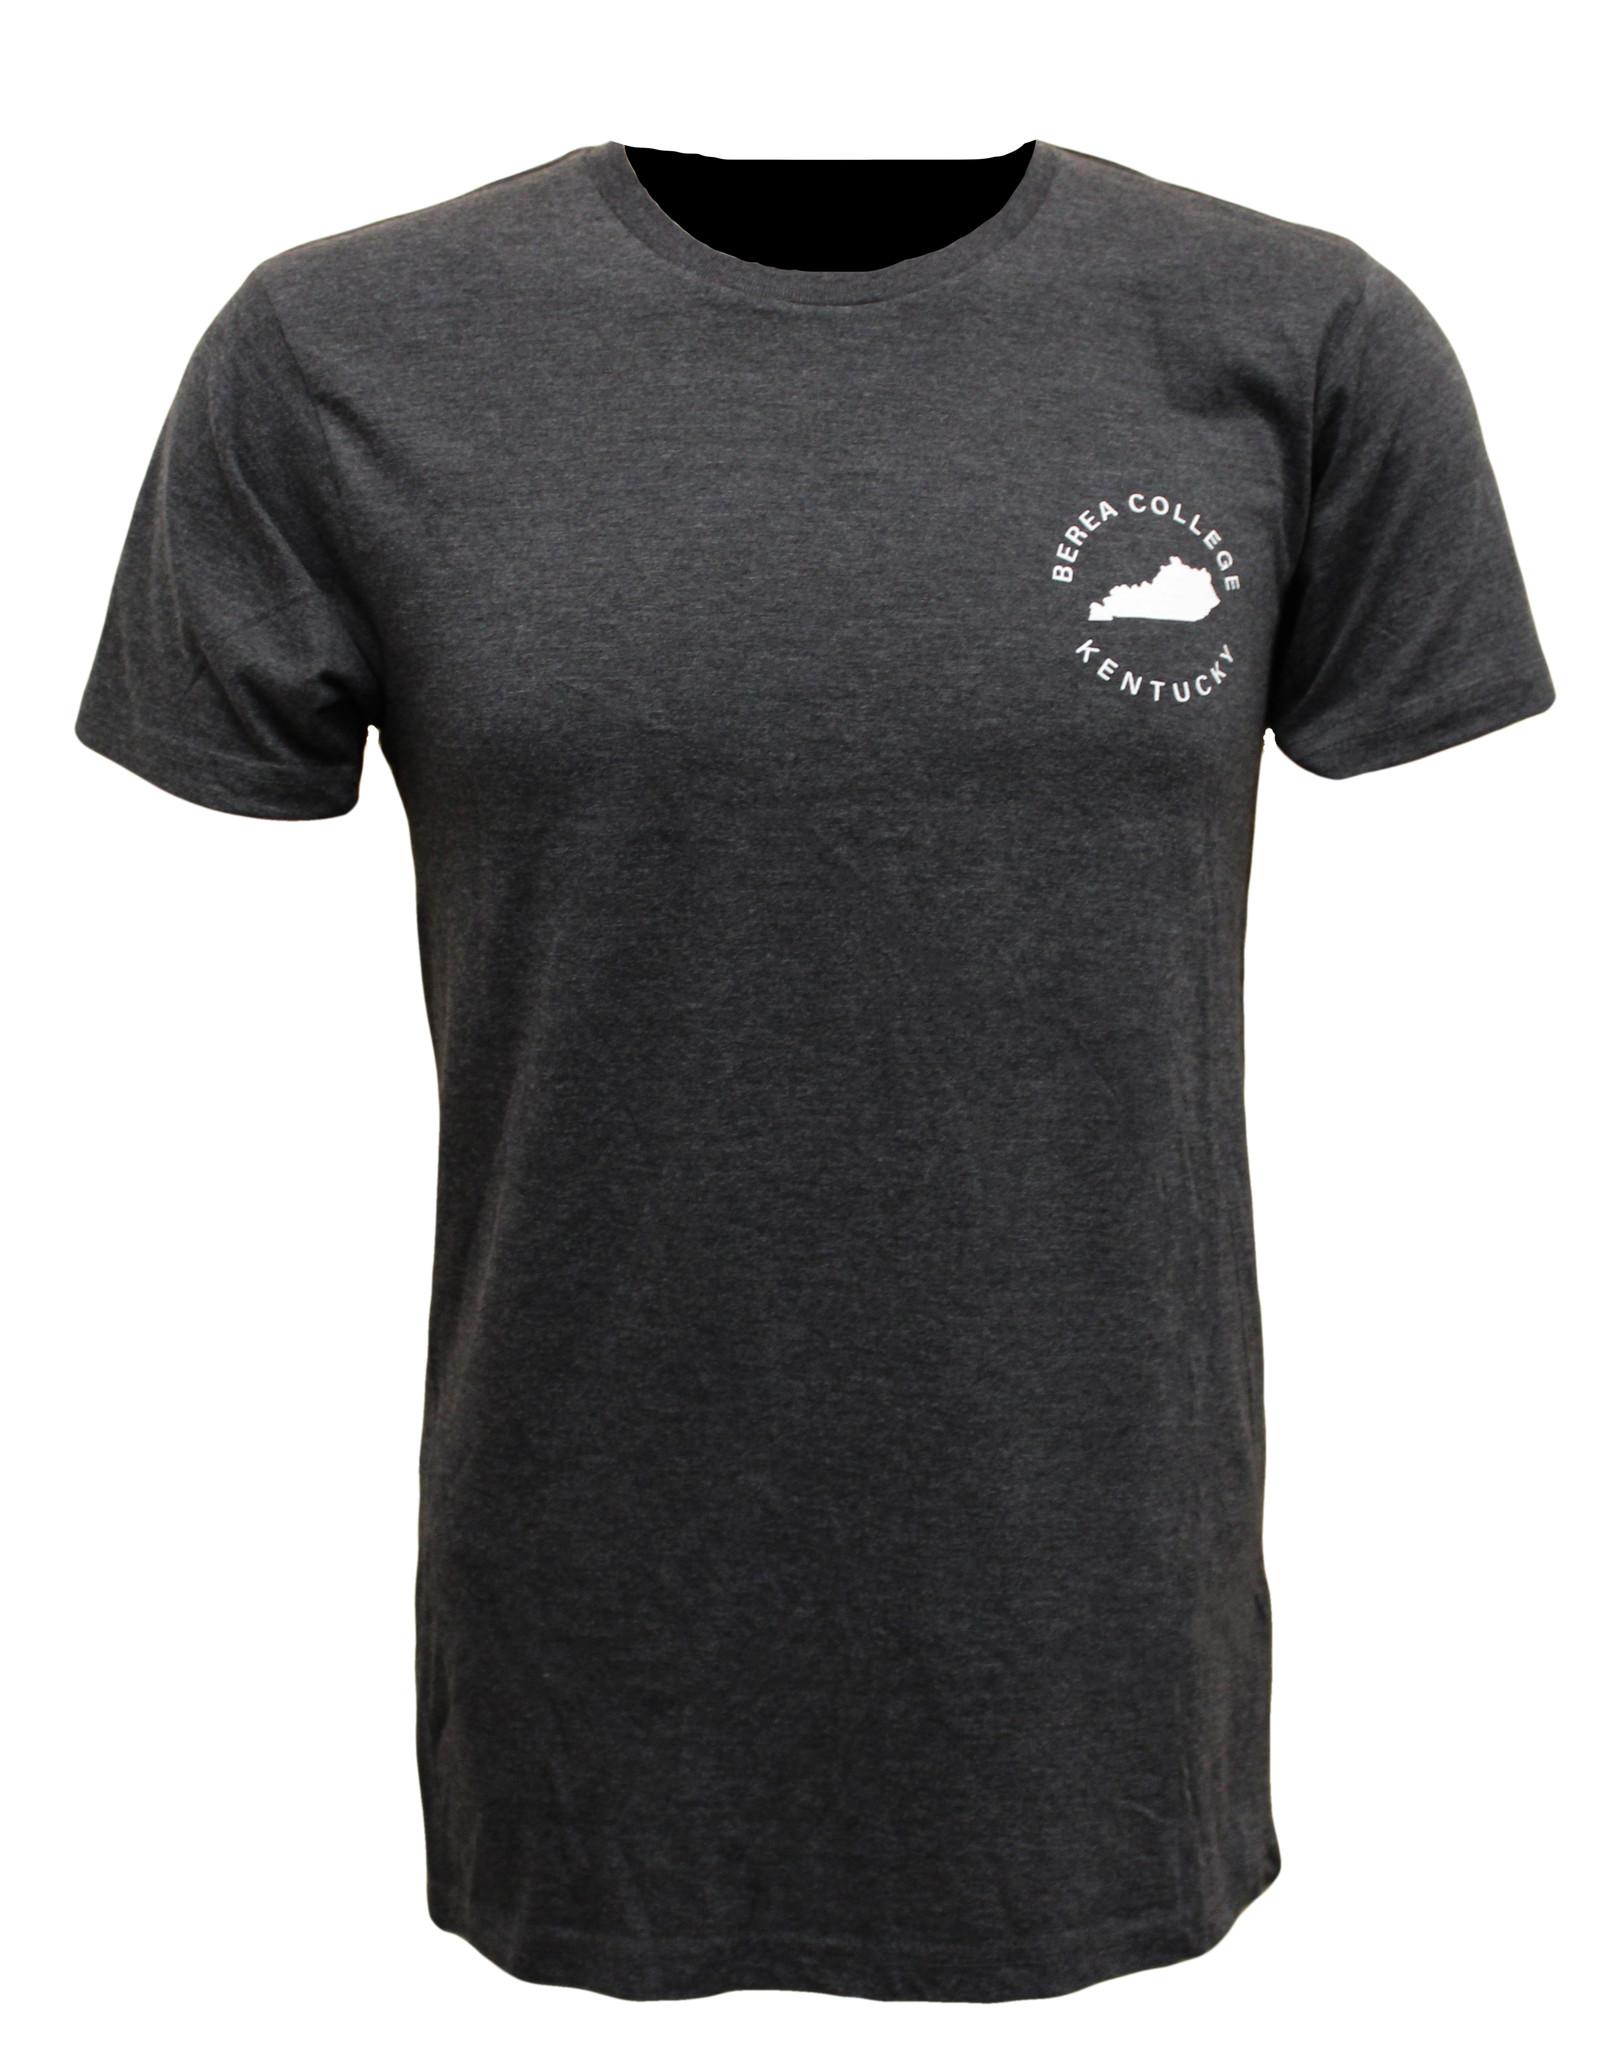 The Pinnacles Berea College T-Shirt-4